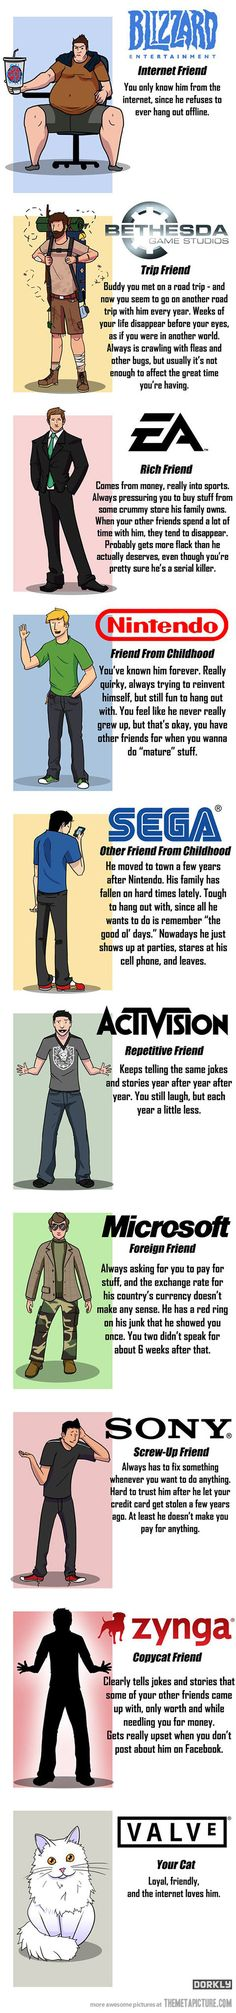 funny-gamer-friend-games-brands